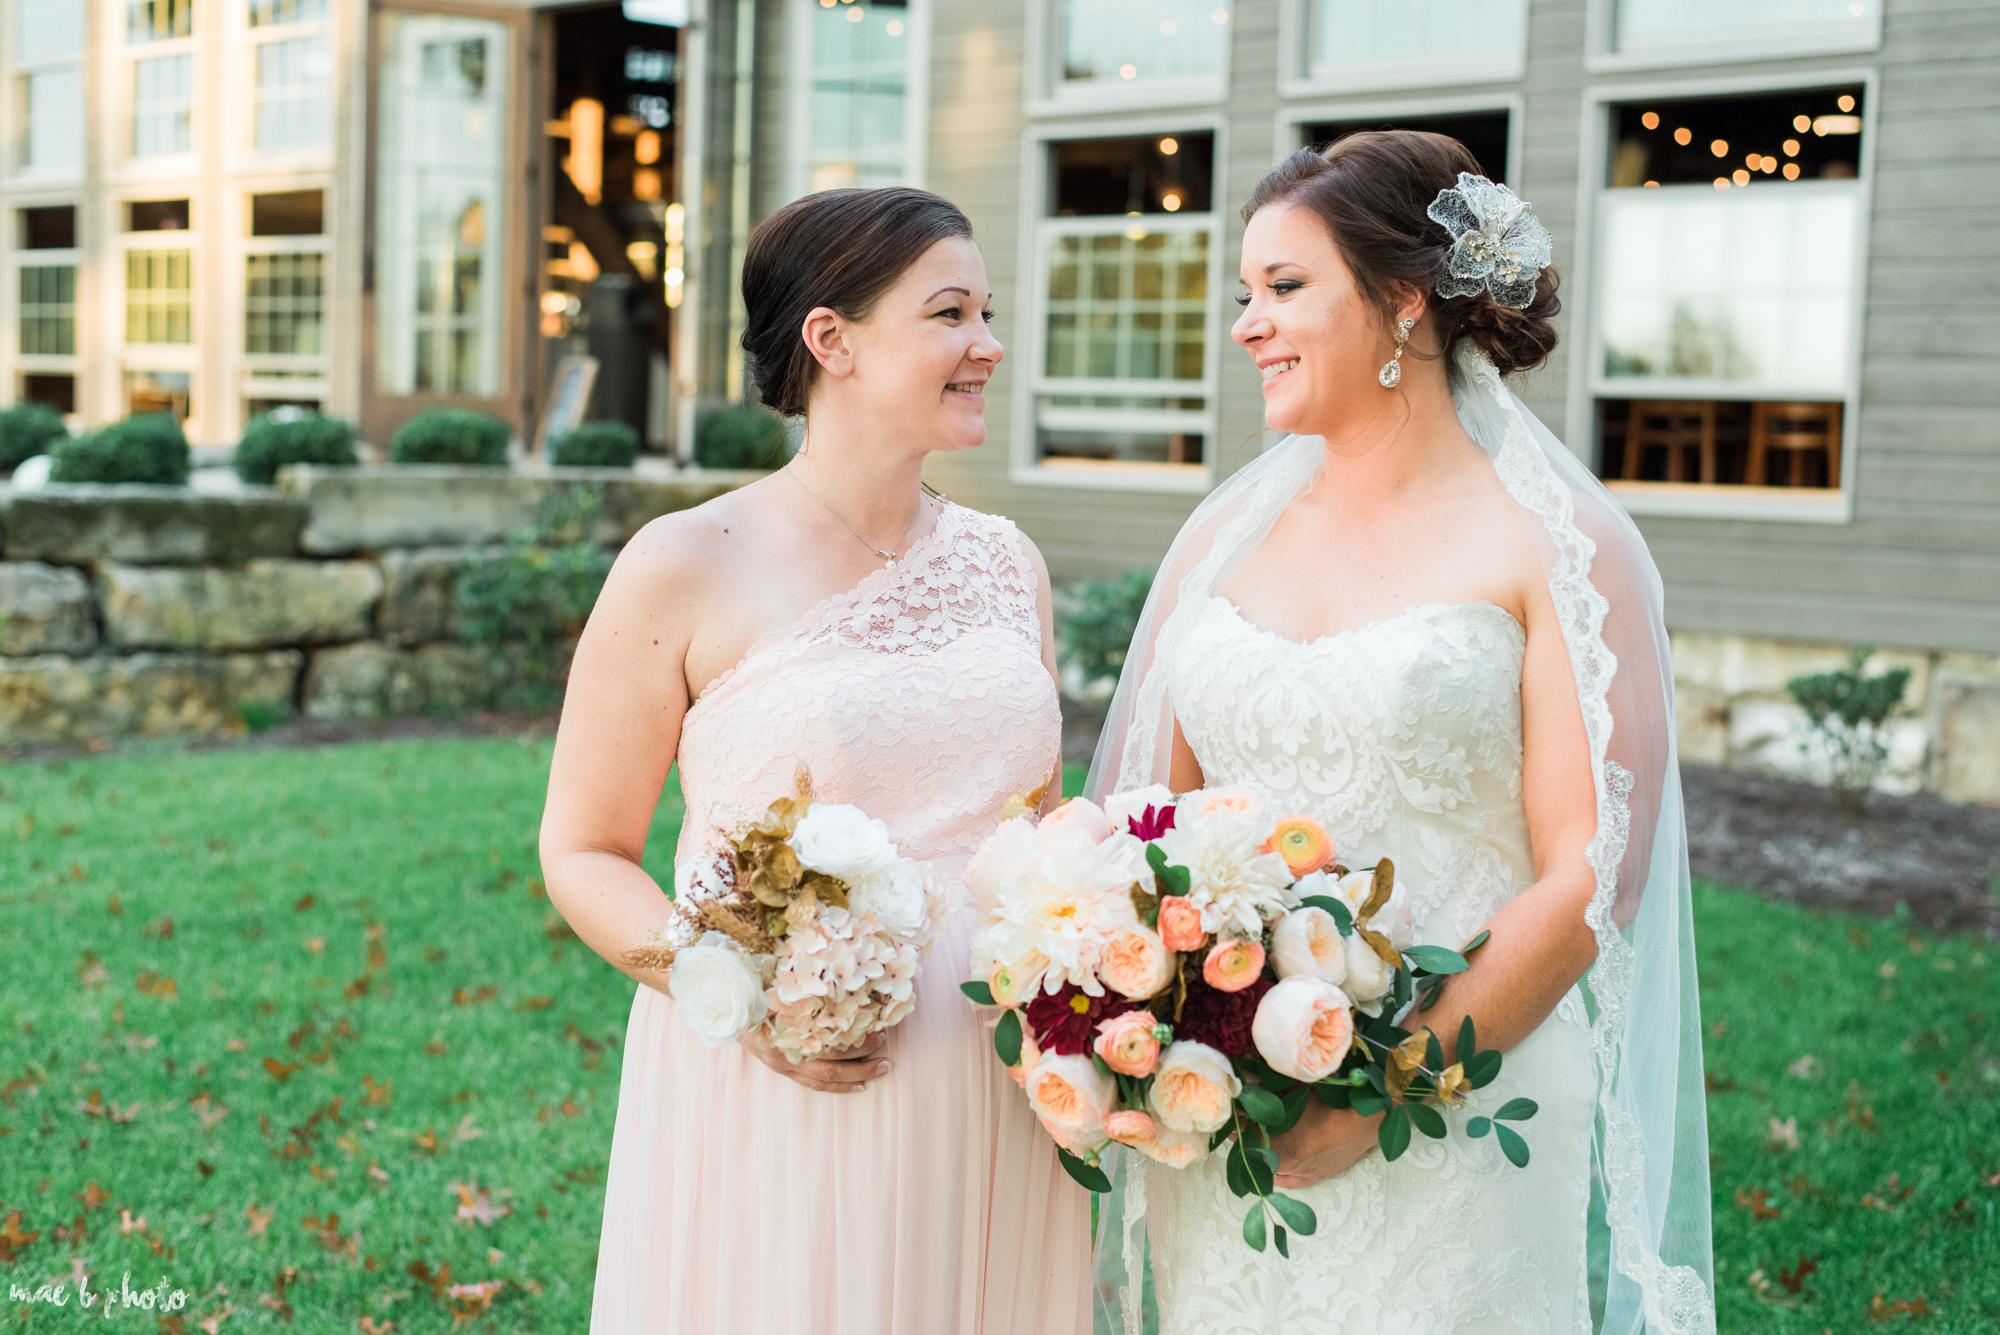 Sarah & Dustin's Rustic Chic Barn Wedding at Hartford Hill Winery in Hartford, Ohio by Mae B Photo-53.jpg